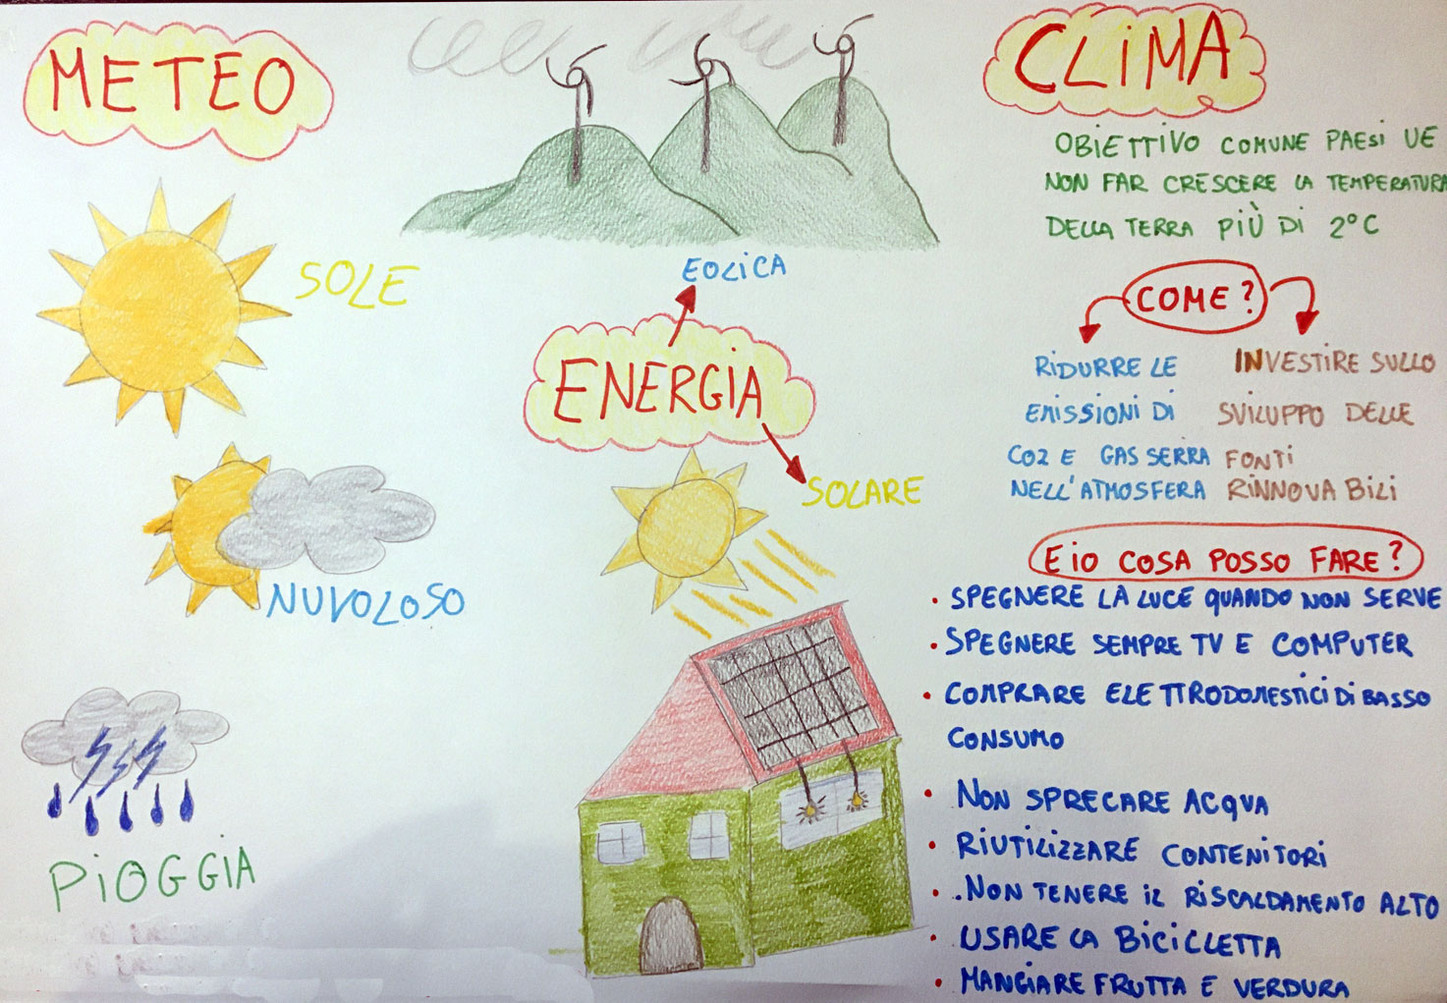 Meteo energia clima